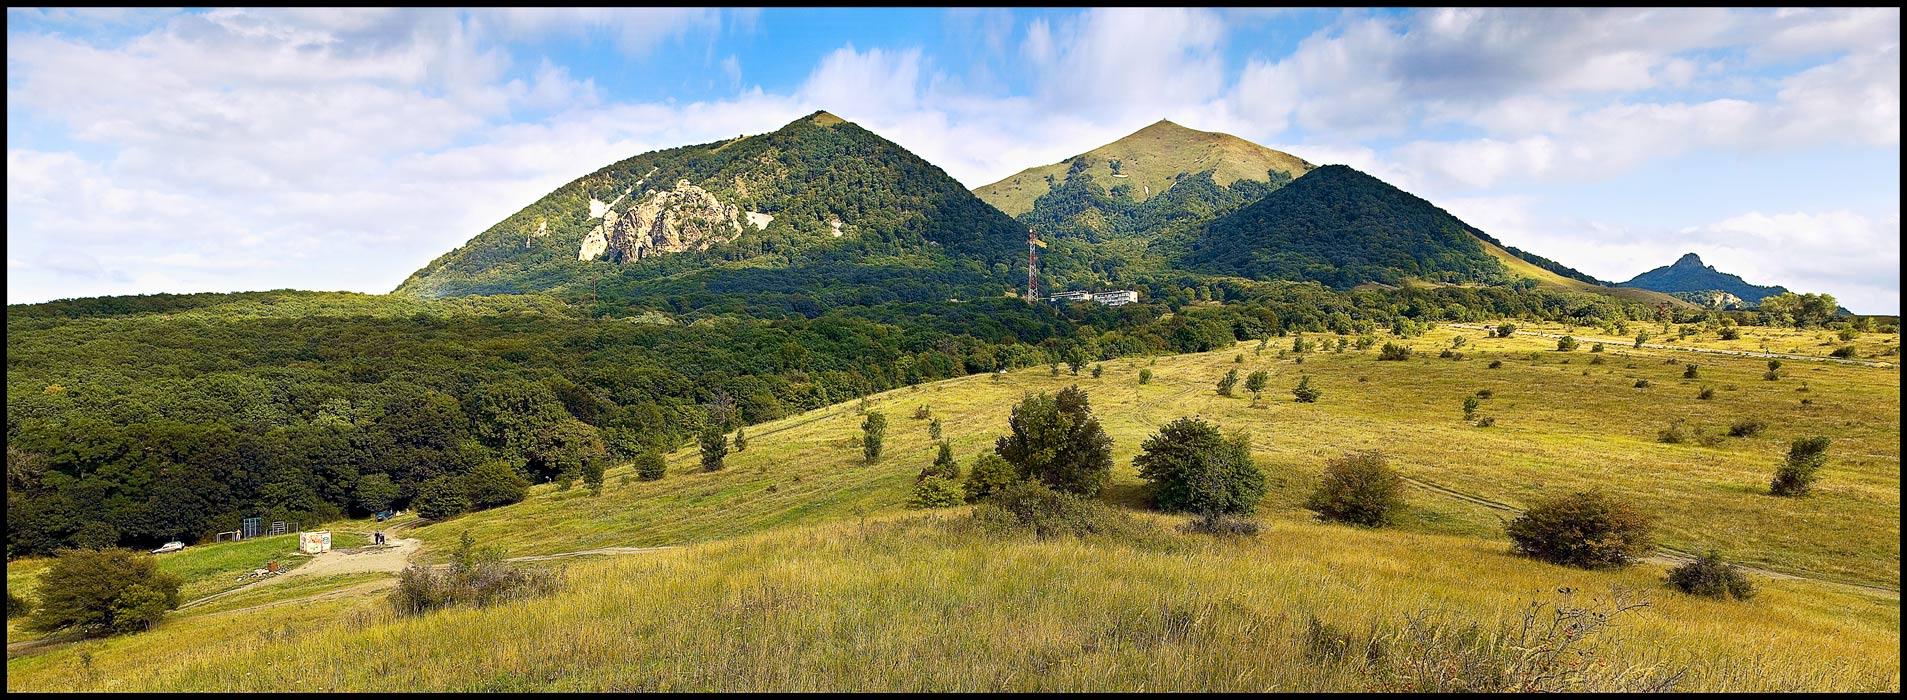 Фото горы Бештау со стороны города Лермонтова